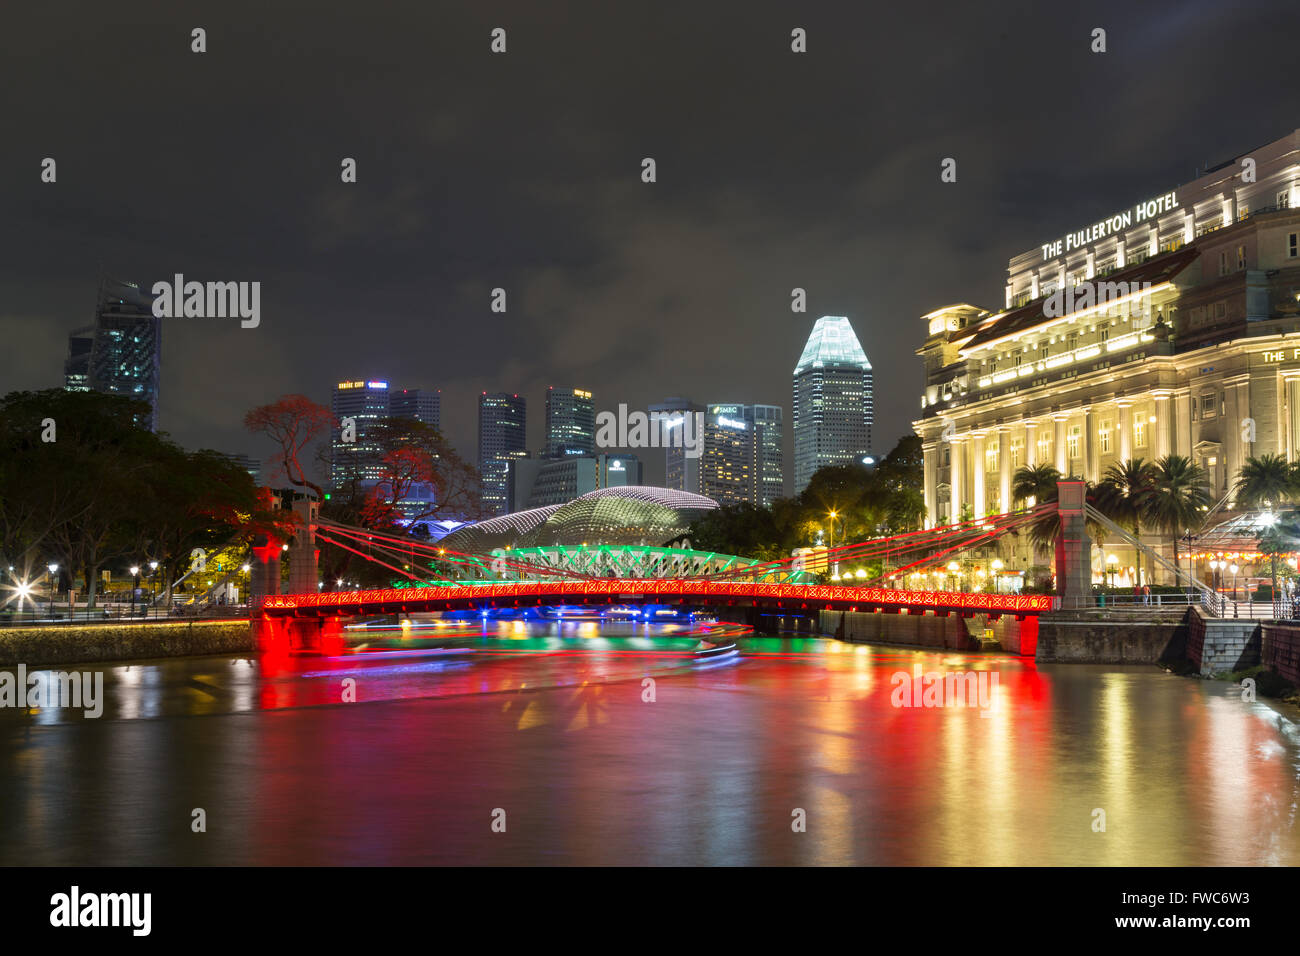 Singapore, Singapore - February 02, 2015: Famous Cavenagh bridgeby night - Stock Image